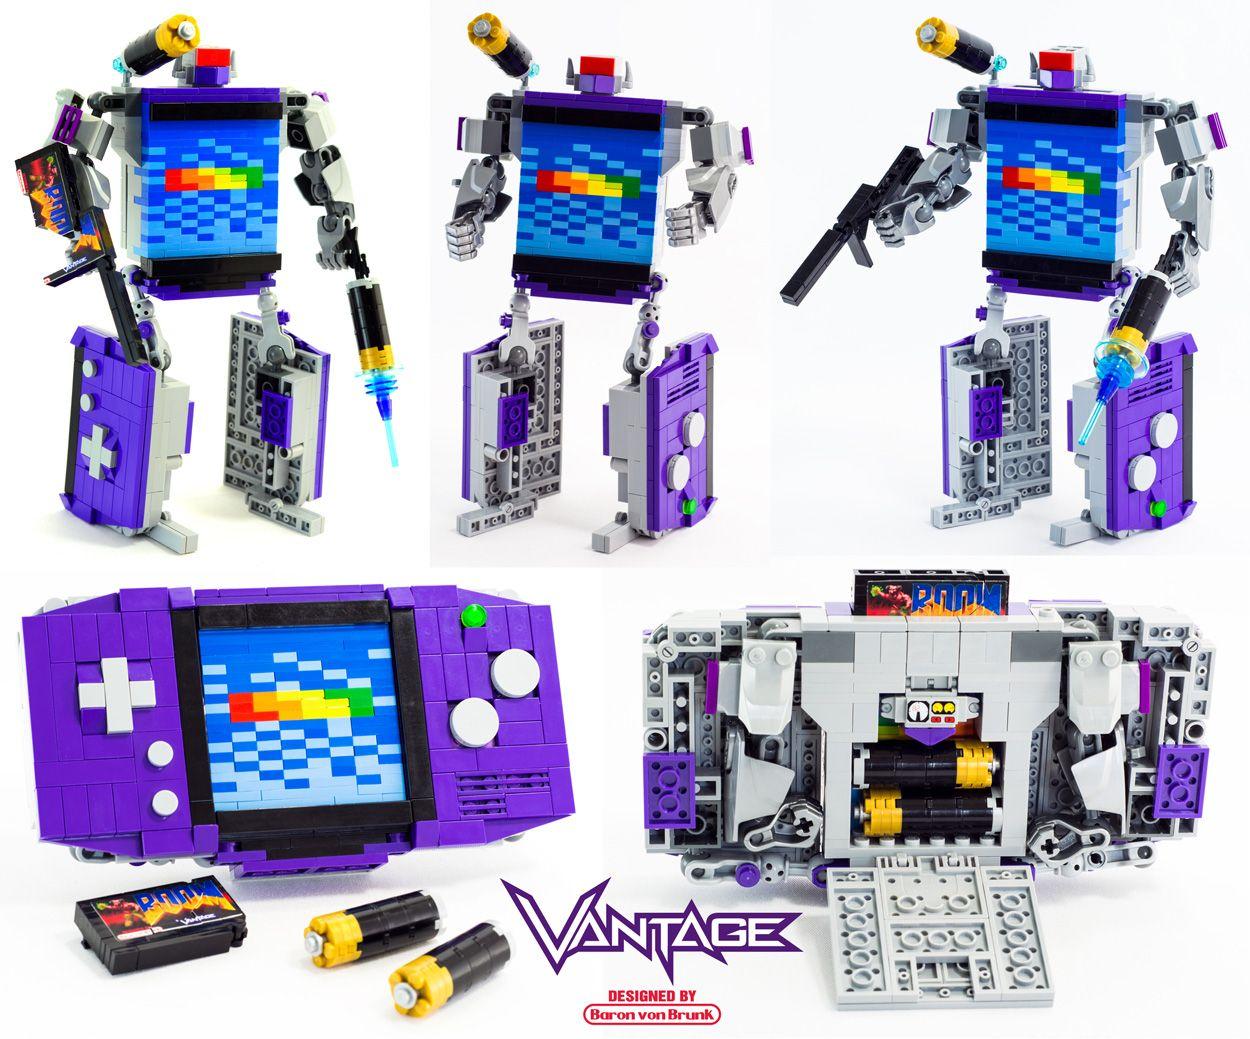 Baron Von Brunk S Website Of Justice Lego Transformers Lego Lego Games